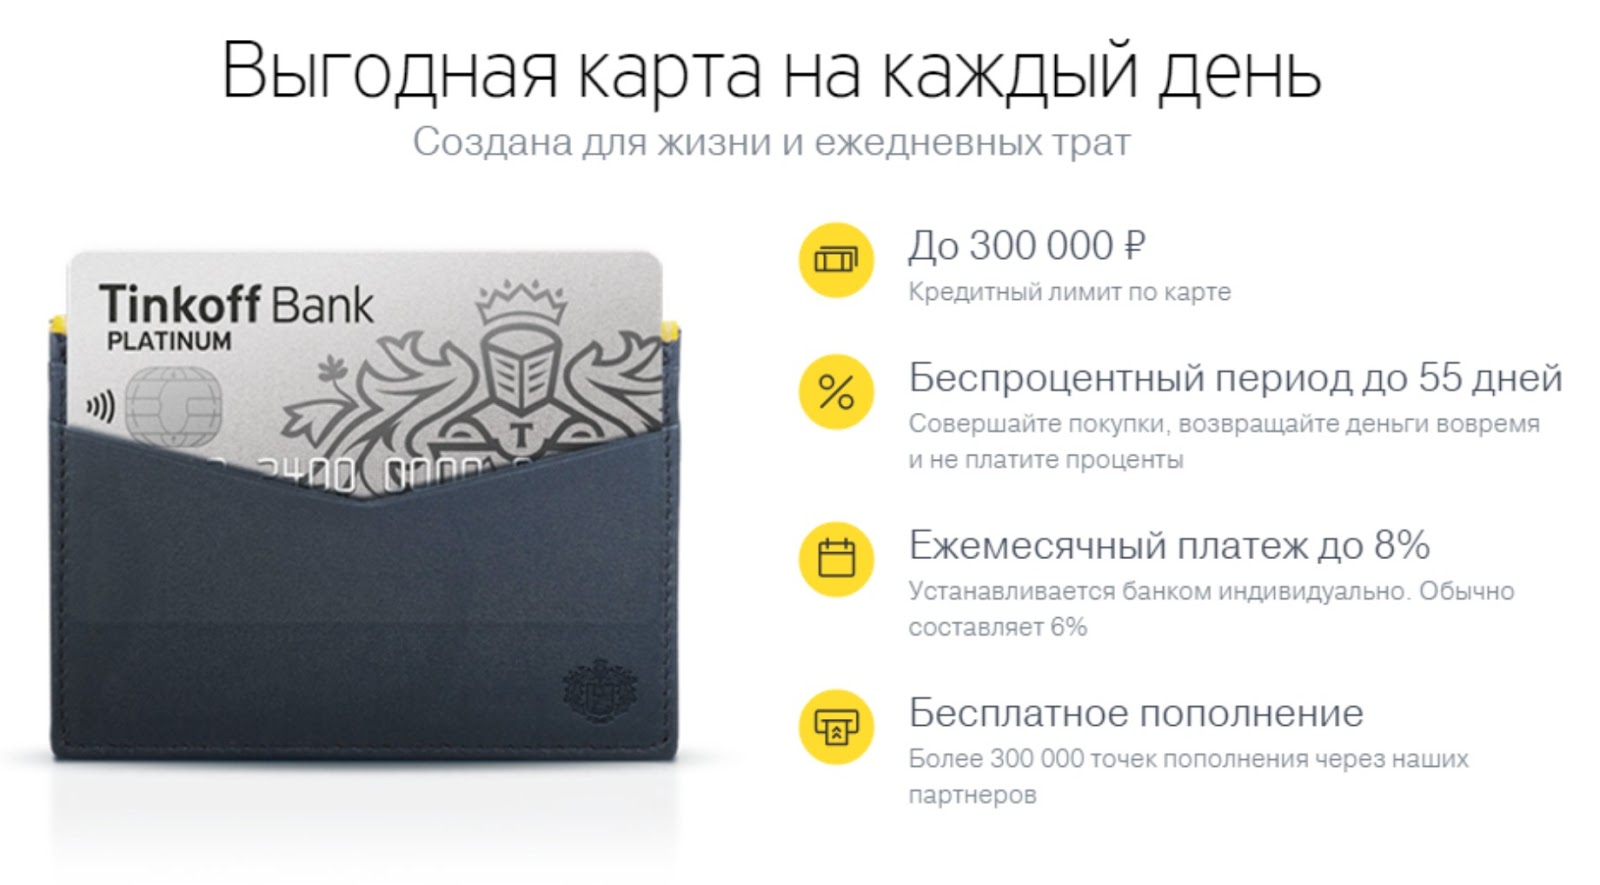 микрозайм на карту онлайн тинькофф банк